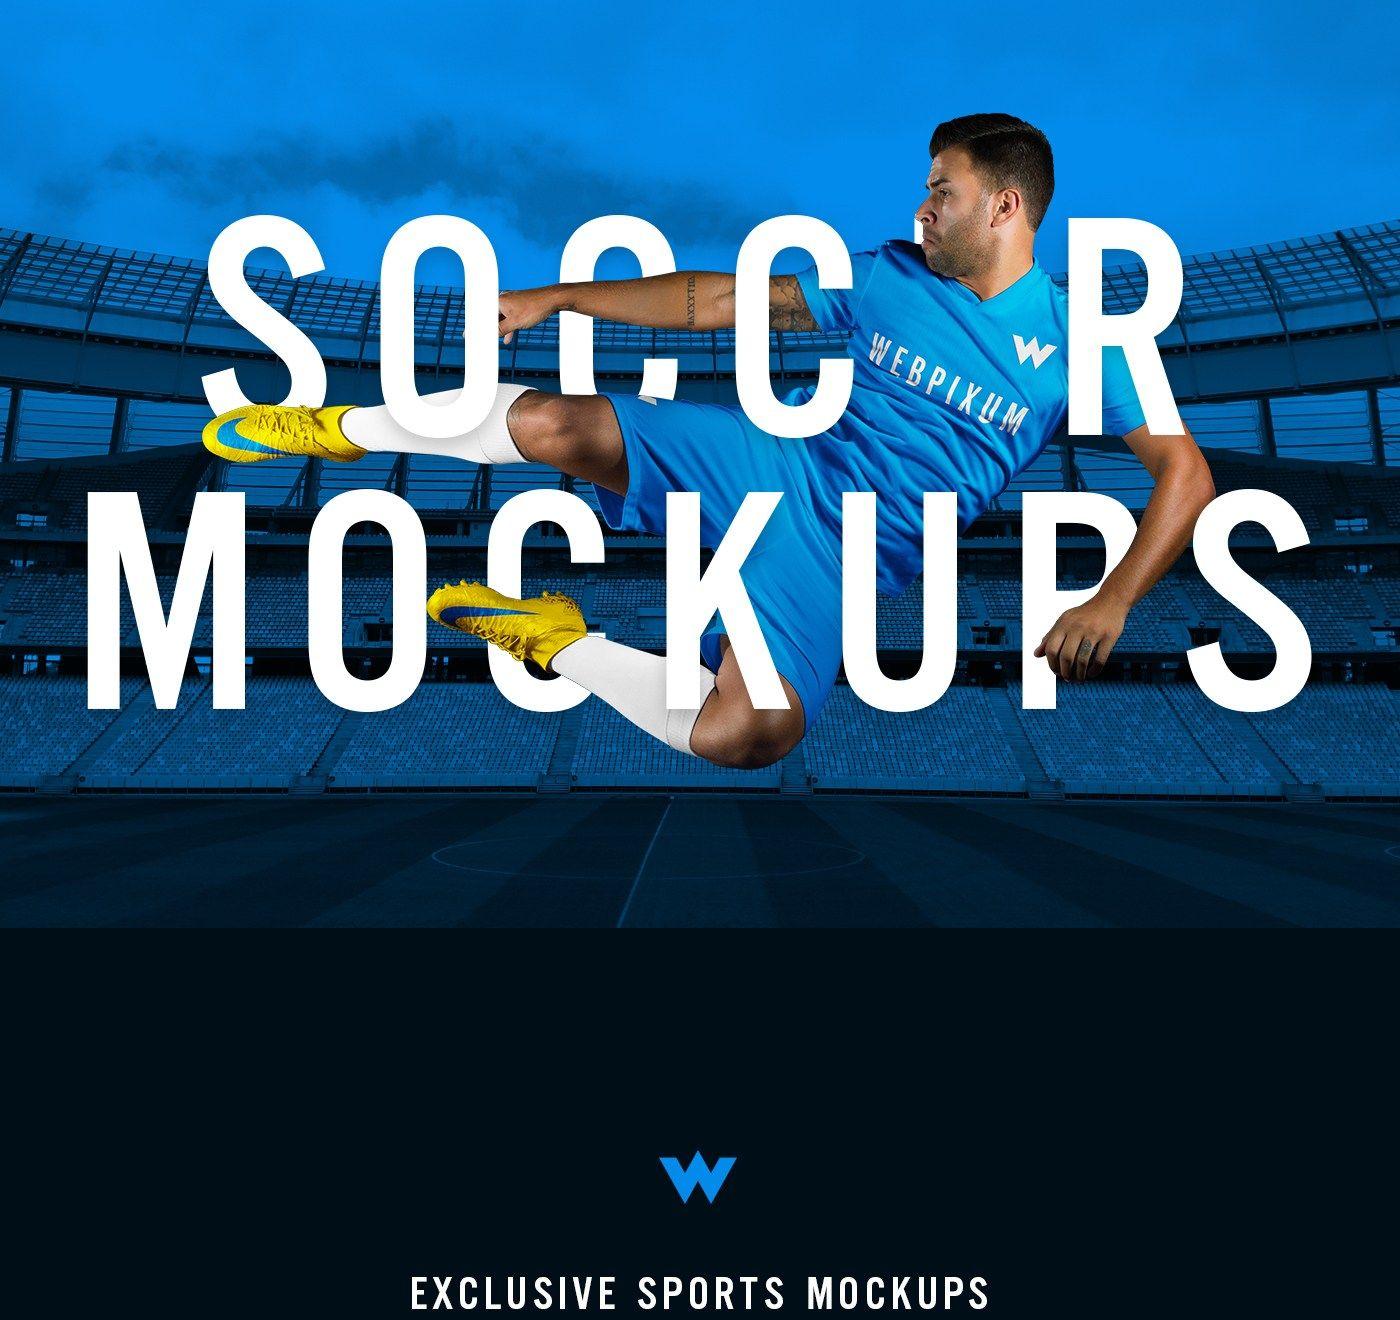 Soccer Kit Mockups Free Psd Creative Juices Pinterest Soccer